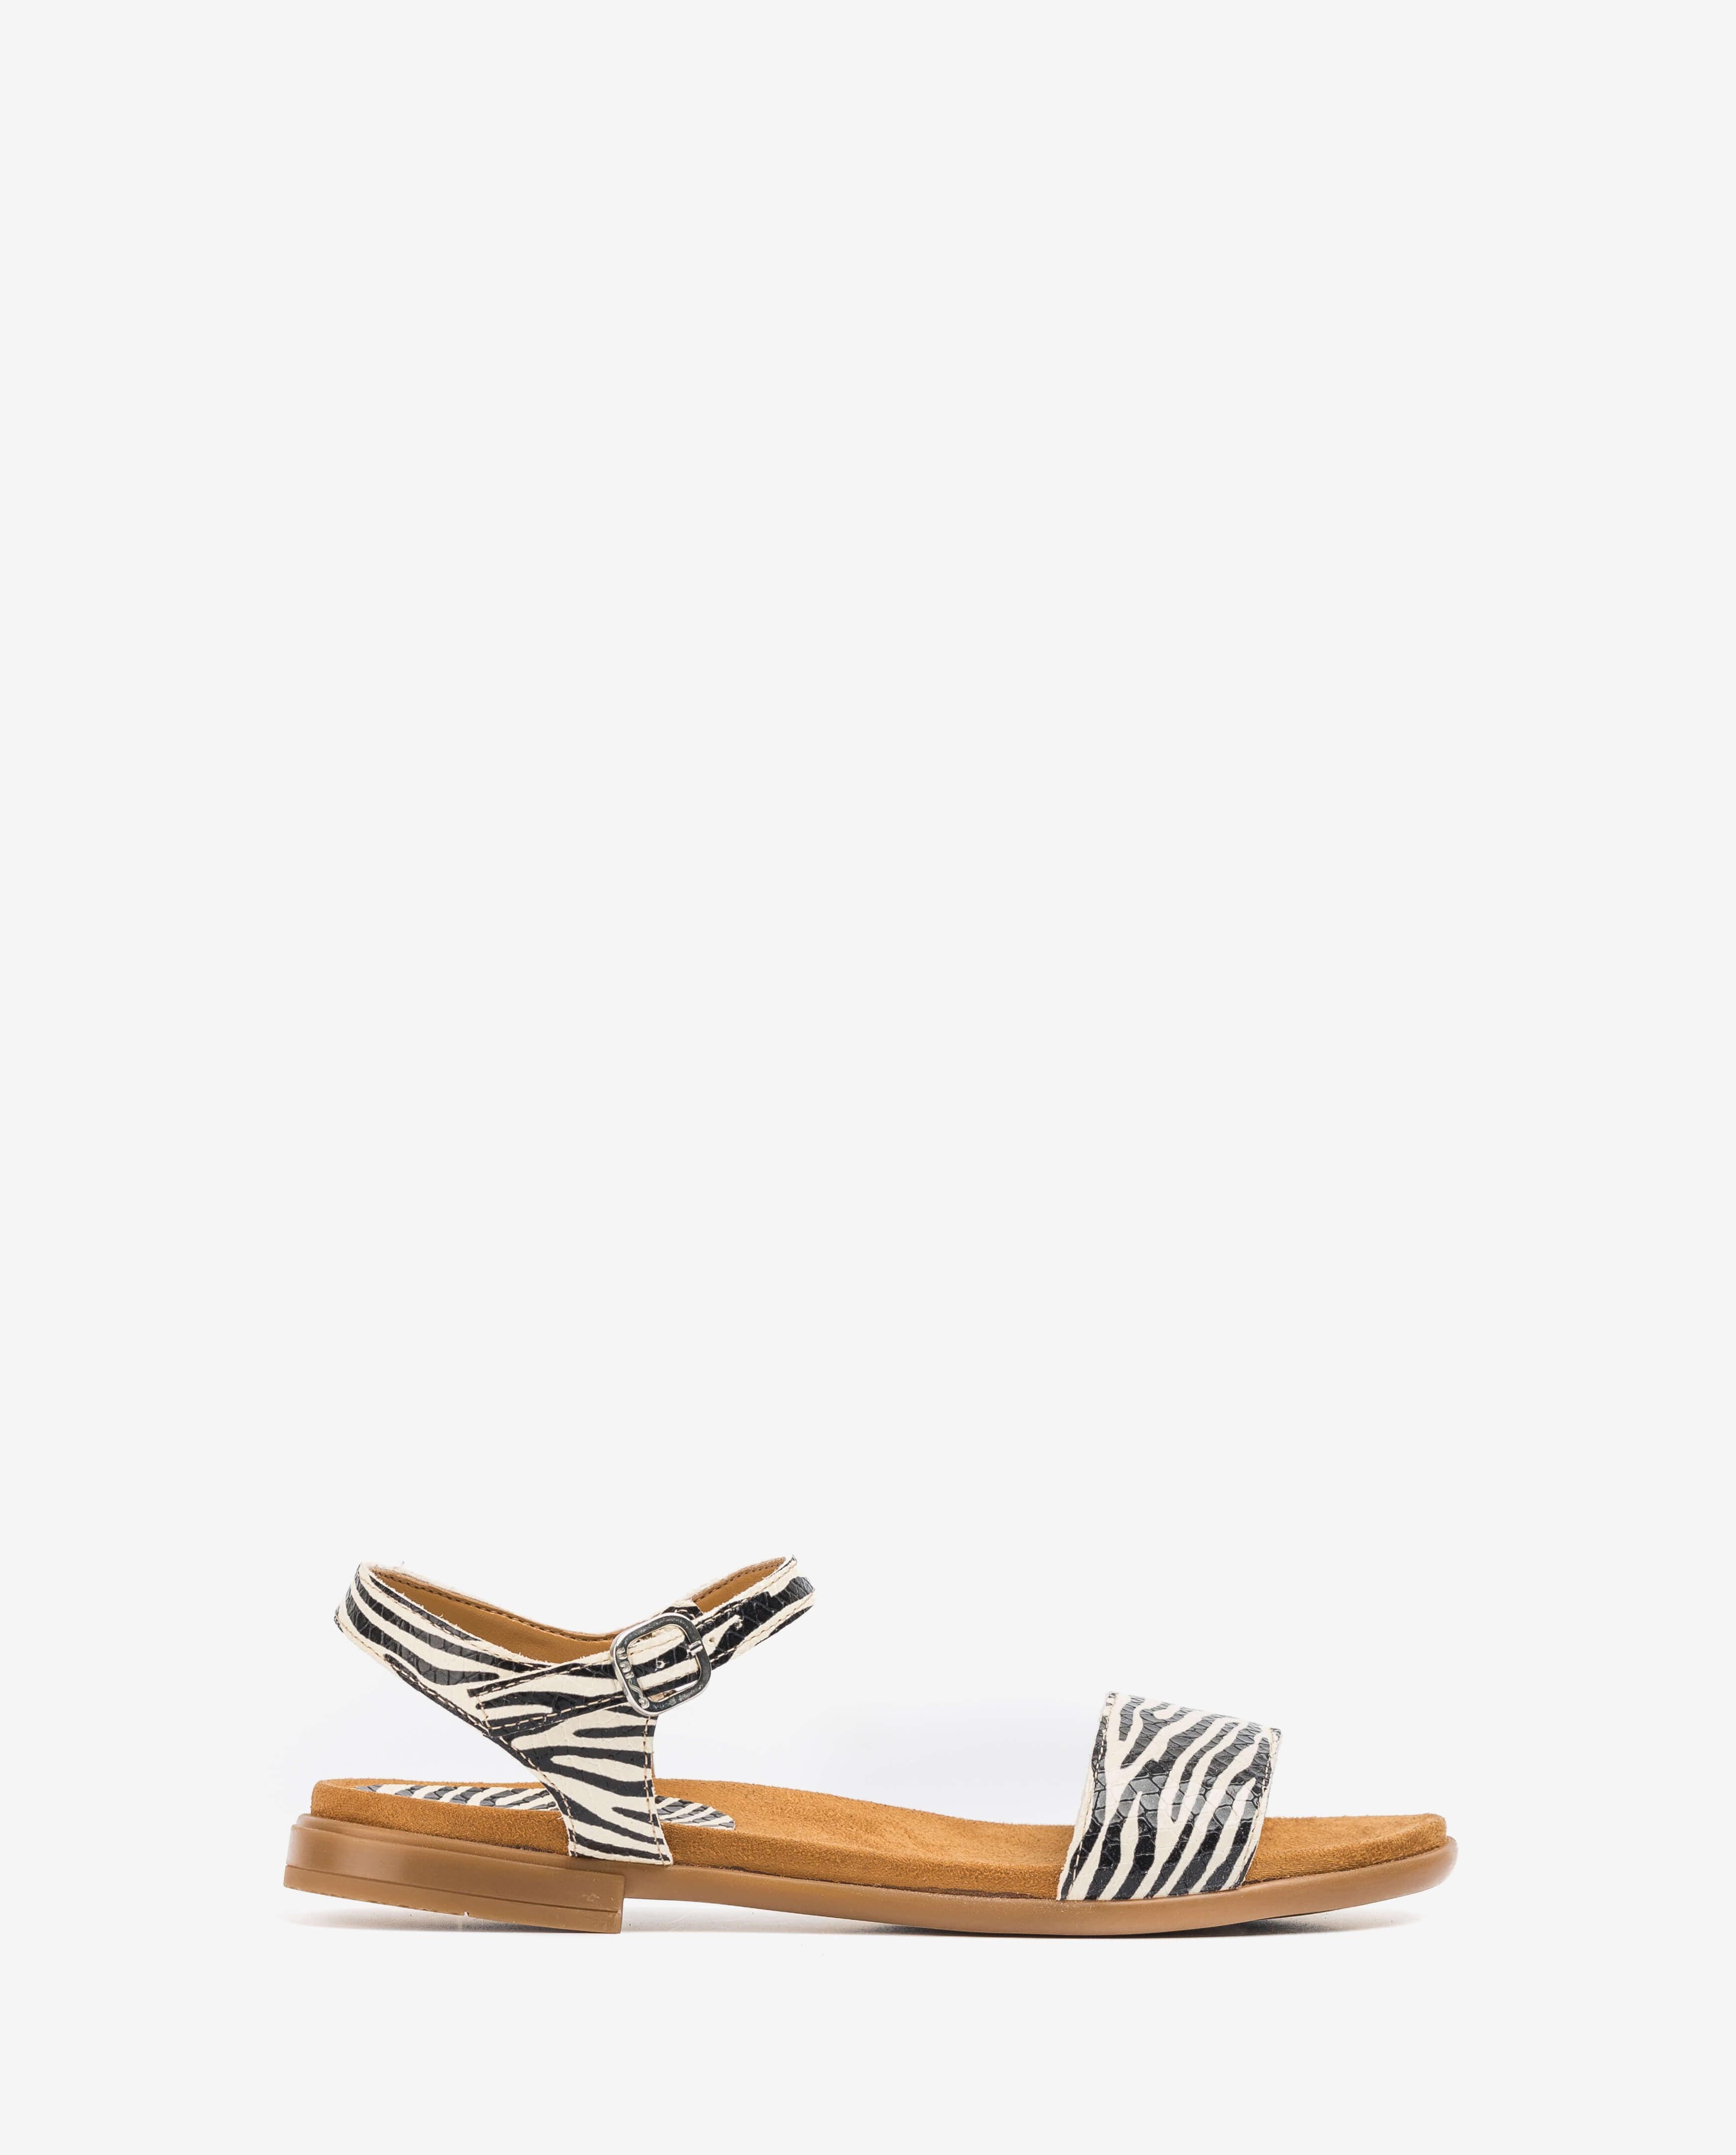 UNISA Little girl zebra sandals LIRITA_20_C_ZEB_CAN ivory 2